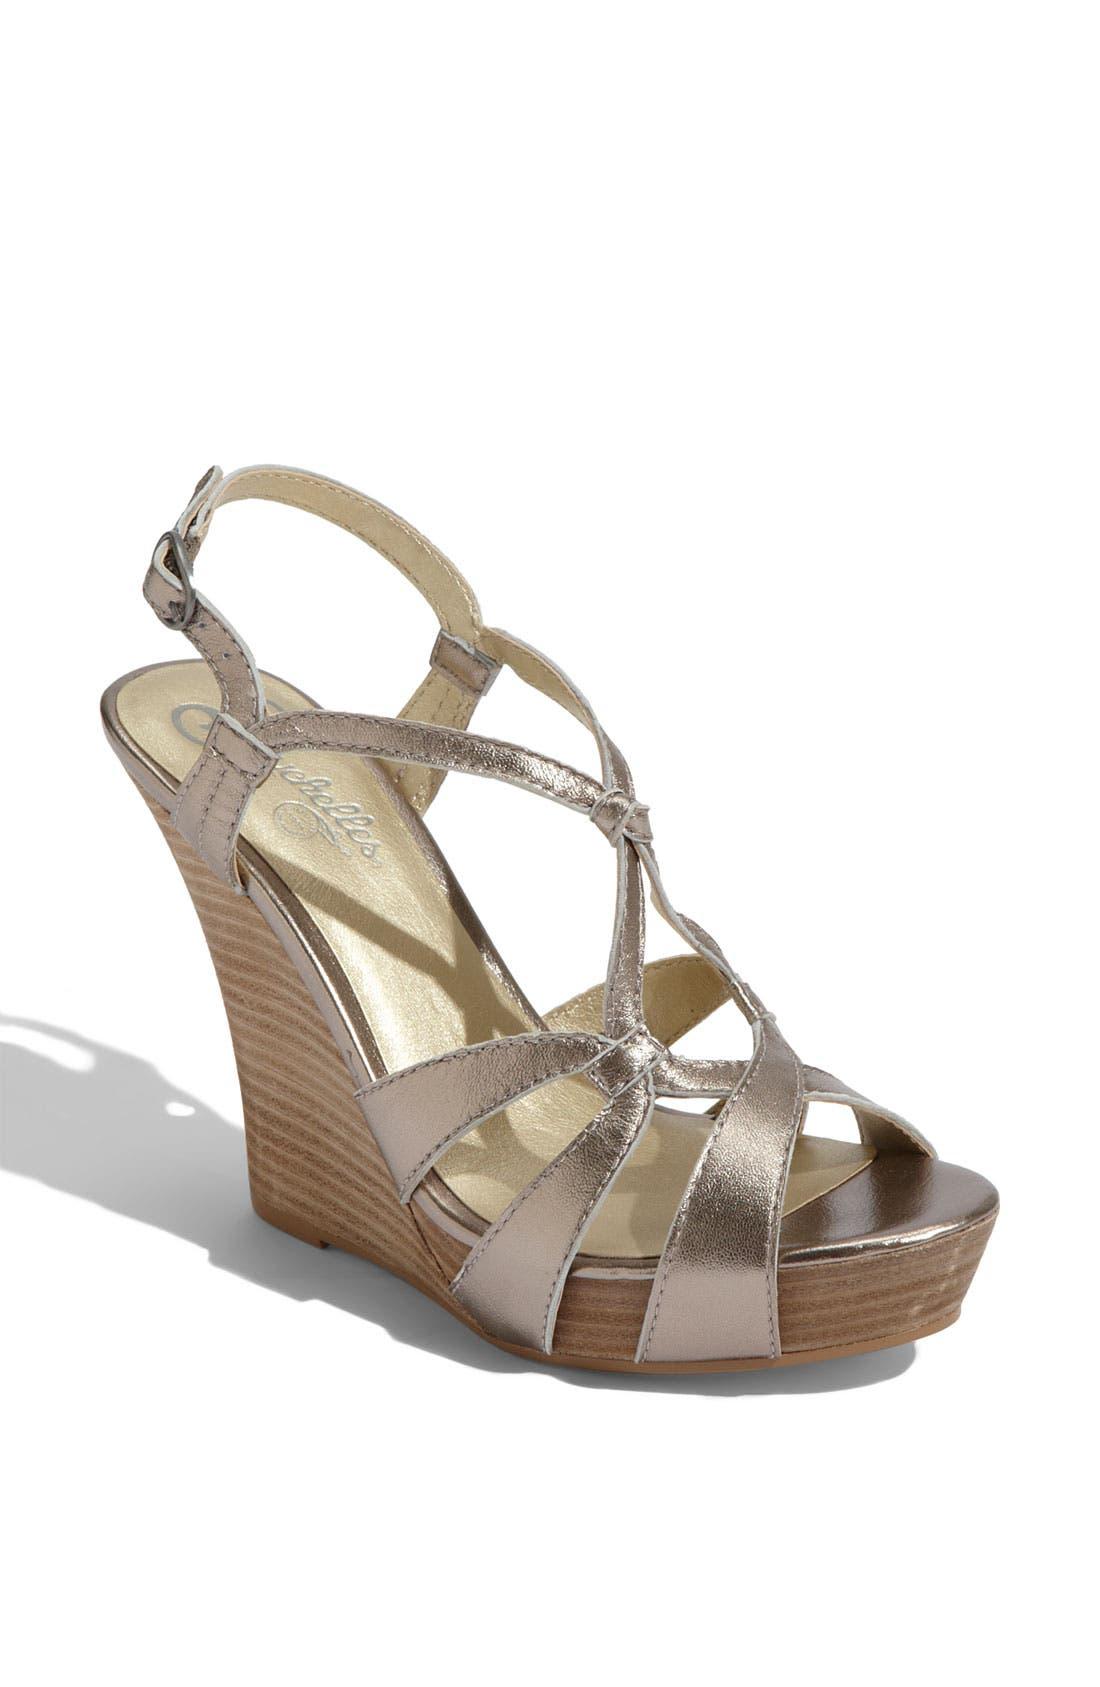 'Purr' Wedge Sandal,                         Main,                         color,